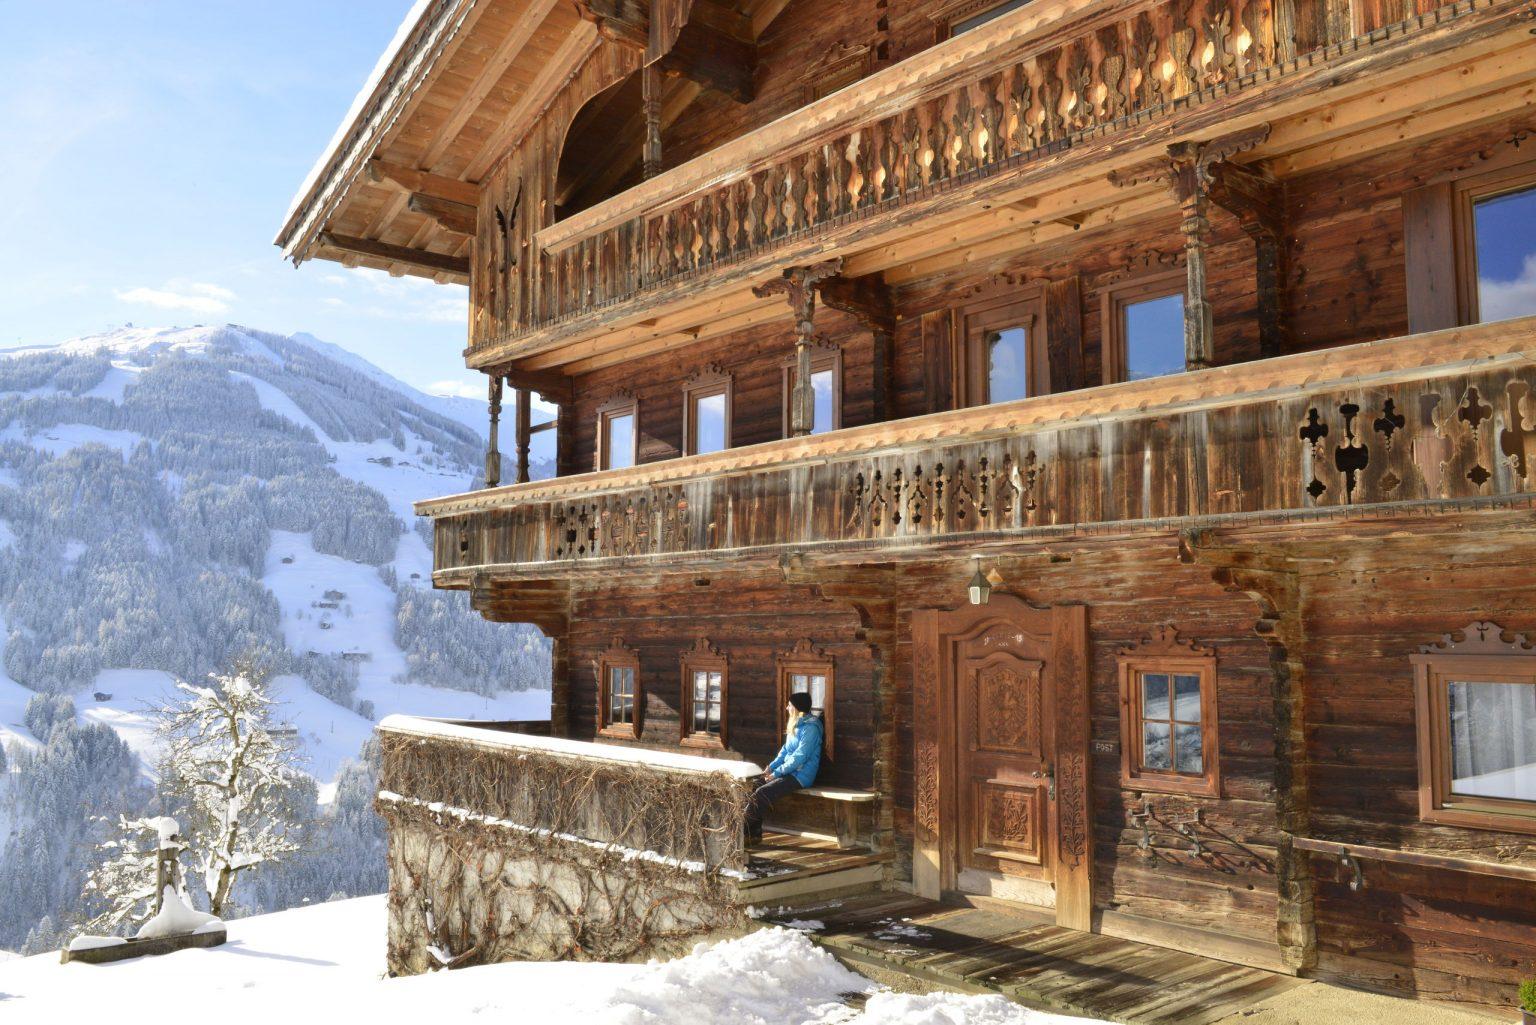 AlpbachtalTourismus_733183-1-News4